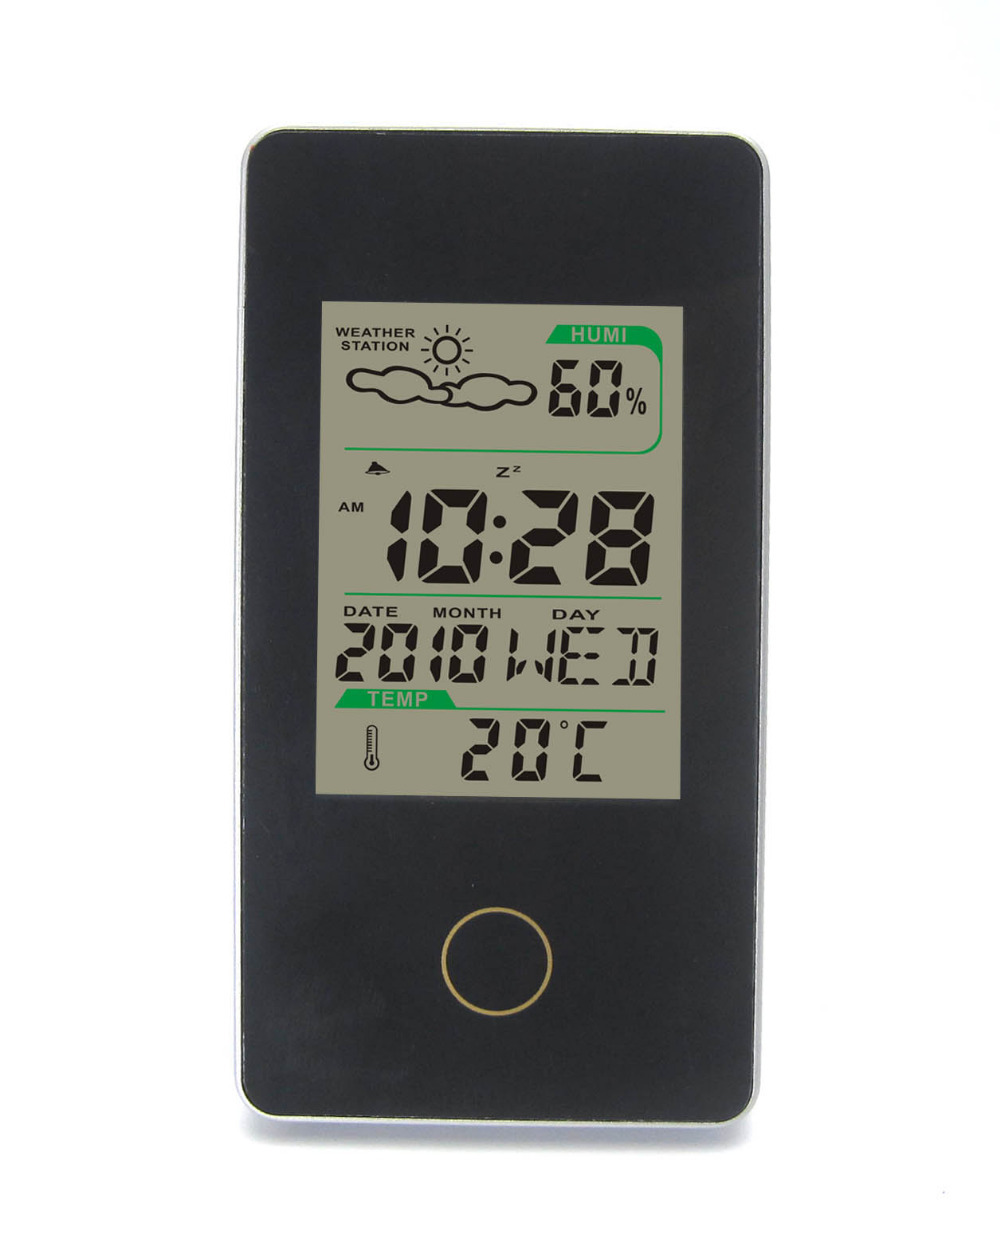 DYKIE Wireless Weather Station Black With Indoor Outdoor Temperature Digital Alarm Clock